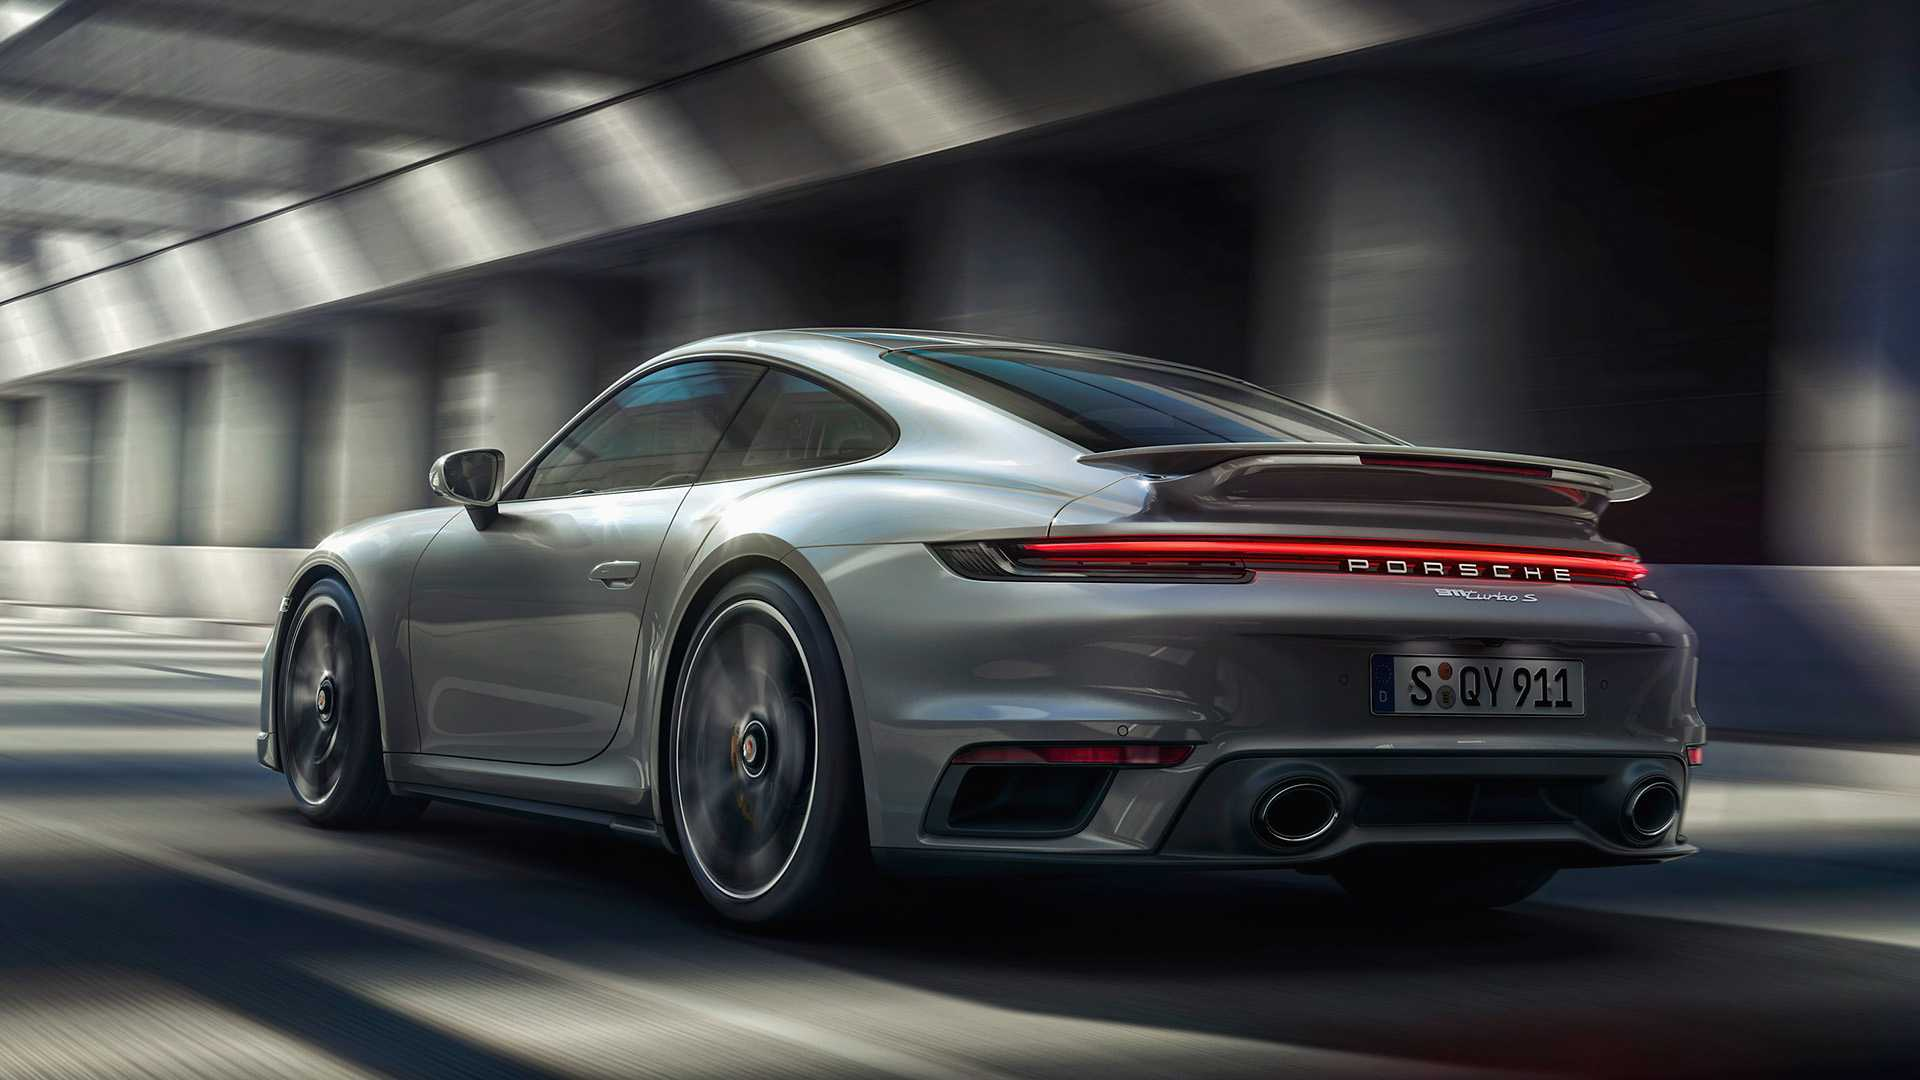 Porsche 911 Turbo S (992) 2021